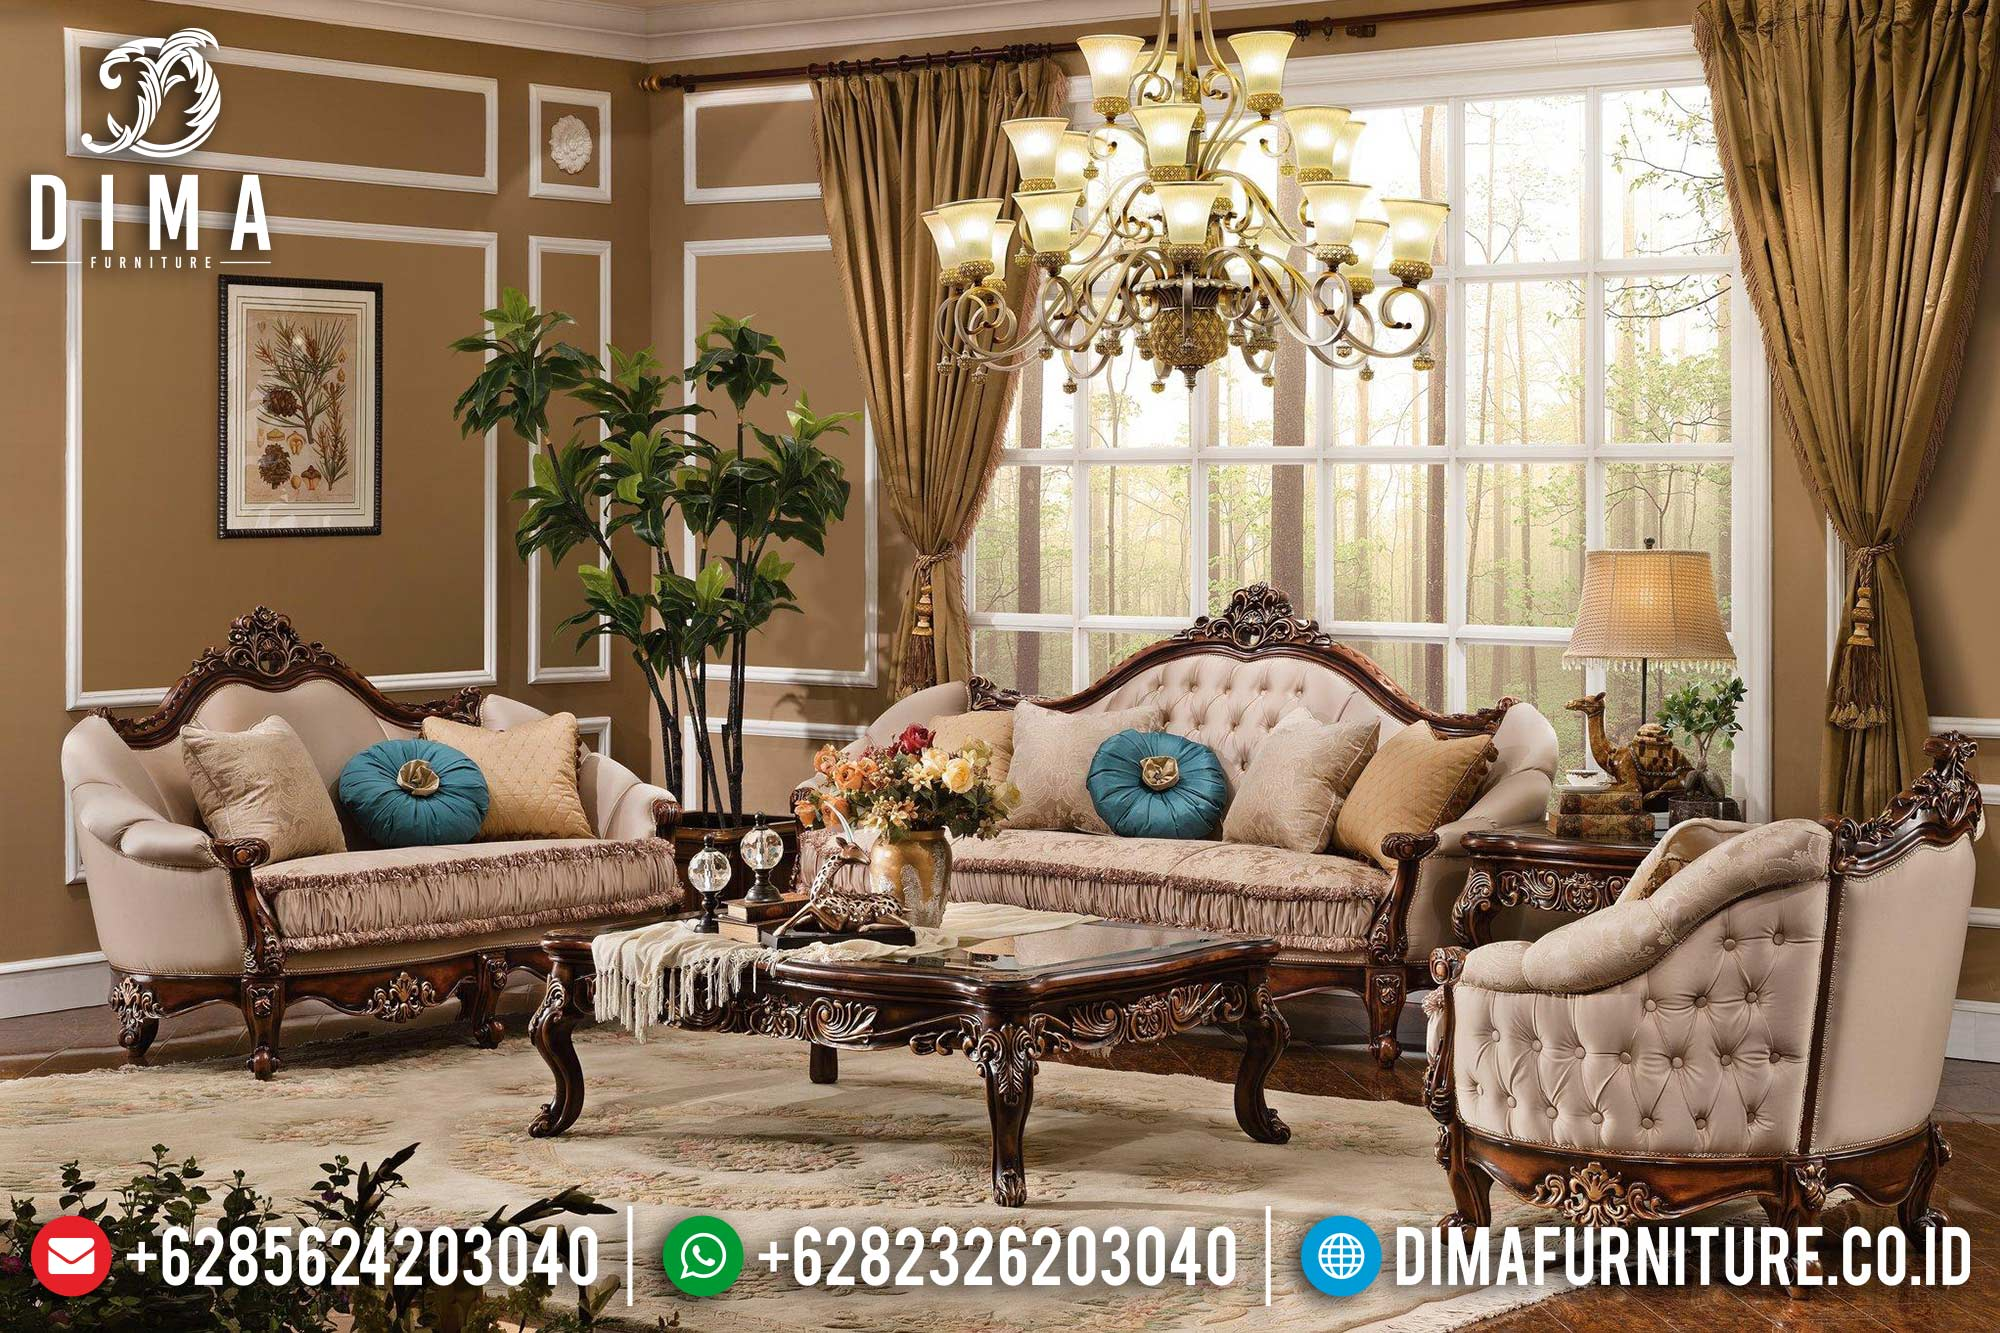 Sofa Tamu Jepara Mewah Astonishing Terbaru Ukiran Classic Luxury DF-0419